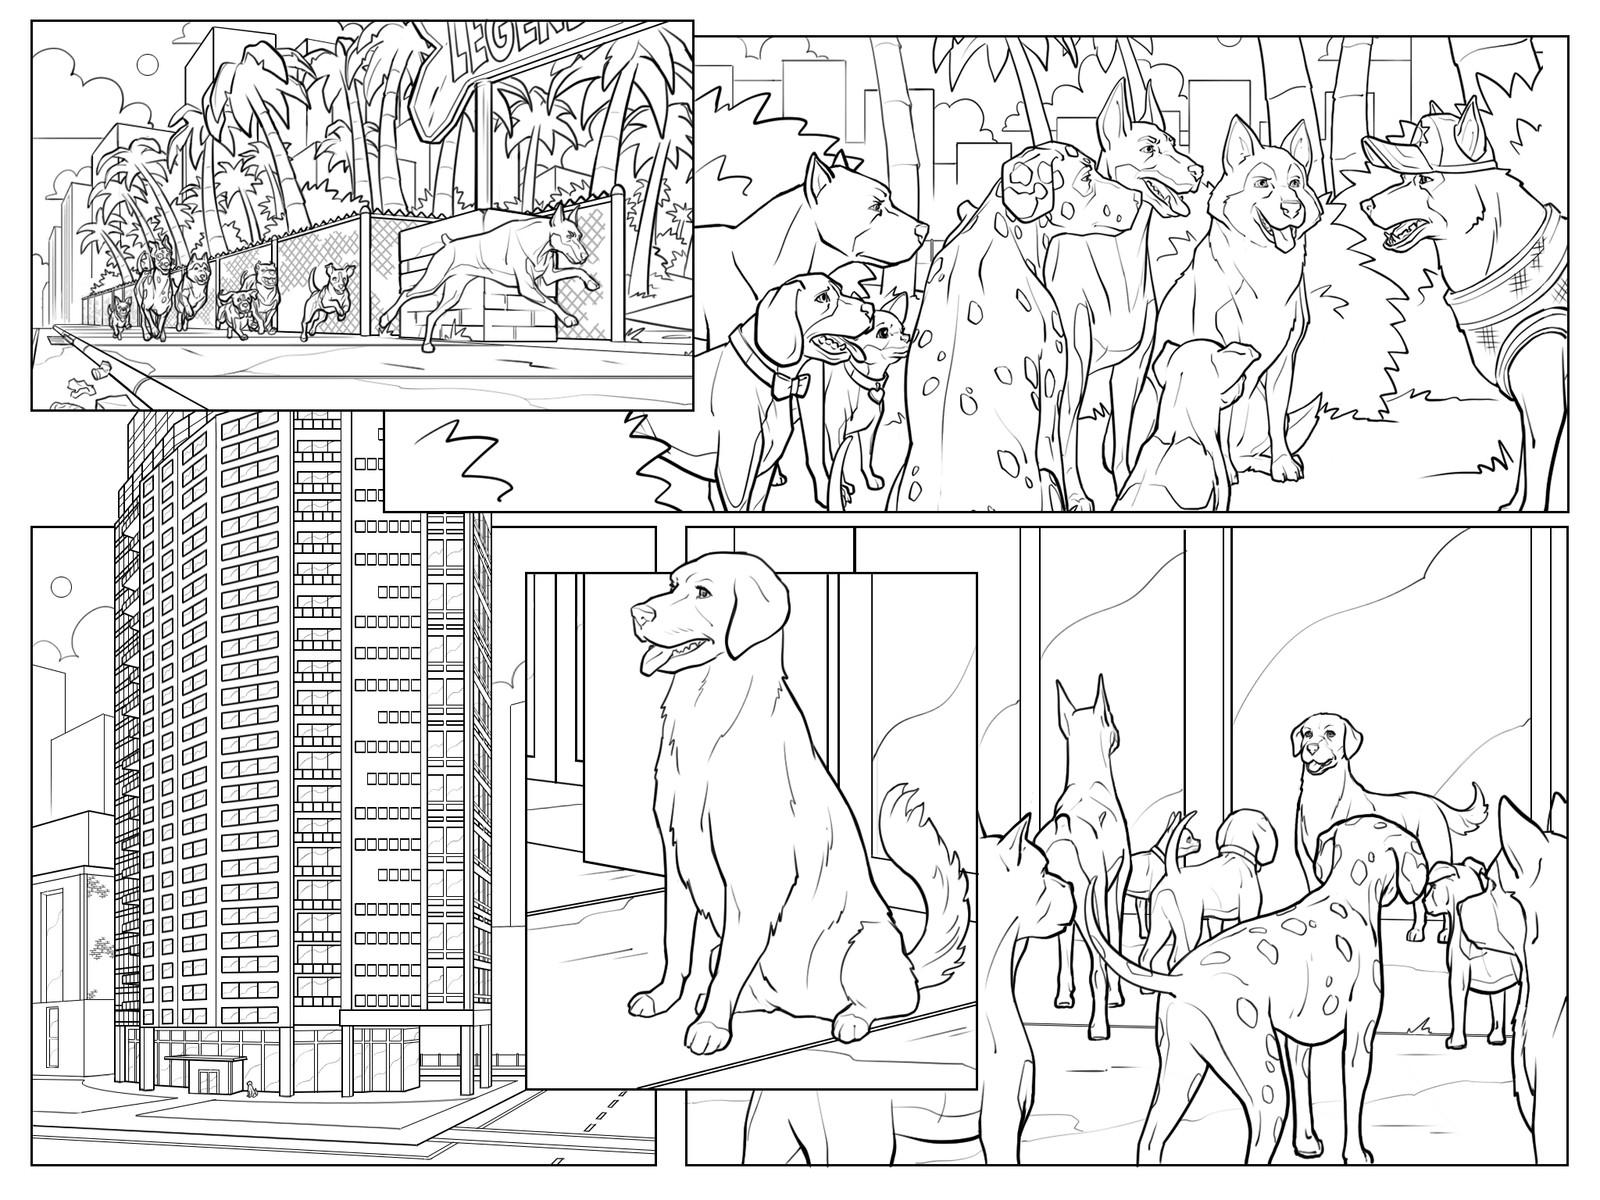 Get 'Em game cutscene comics Pg 15 Inks  Behdad Sami Interactive © 2018